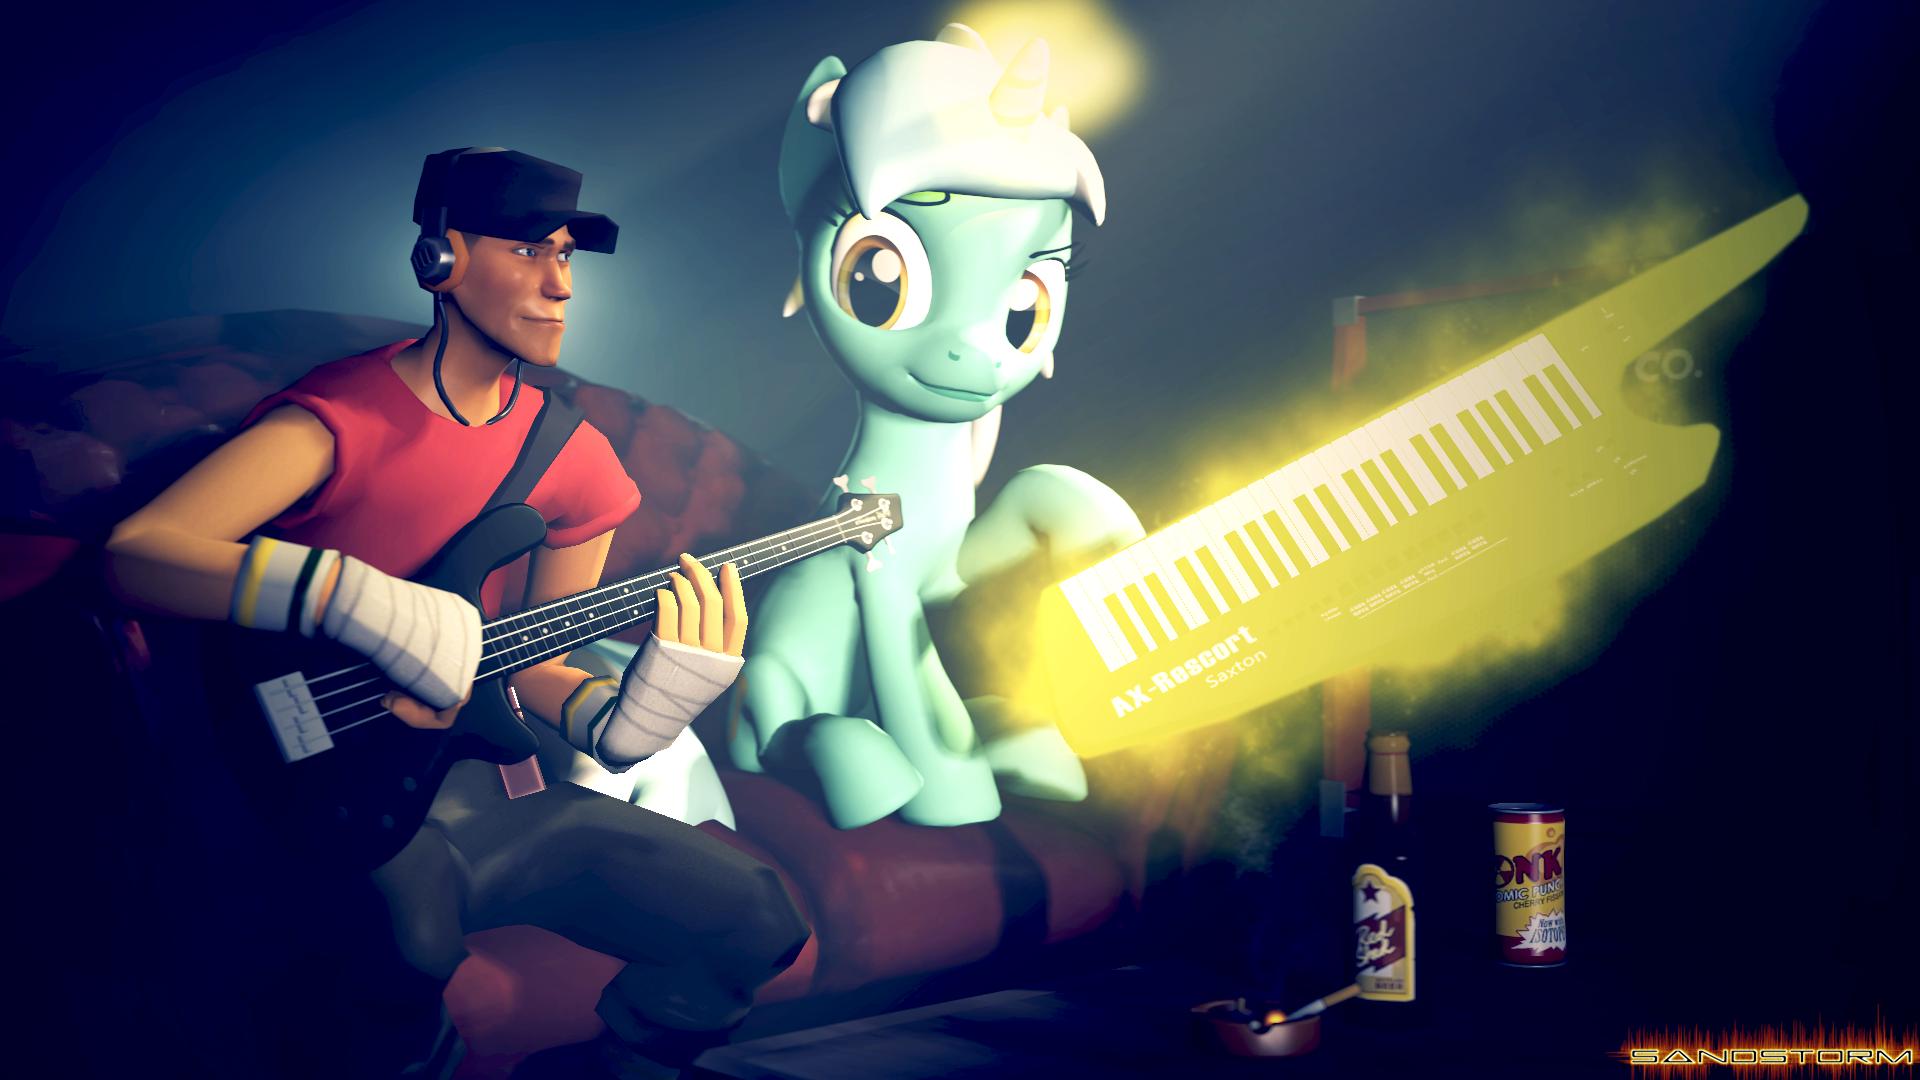 Music Buddies [SFM] by Sandstorm-Arts